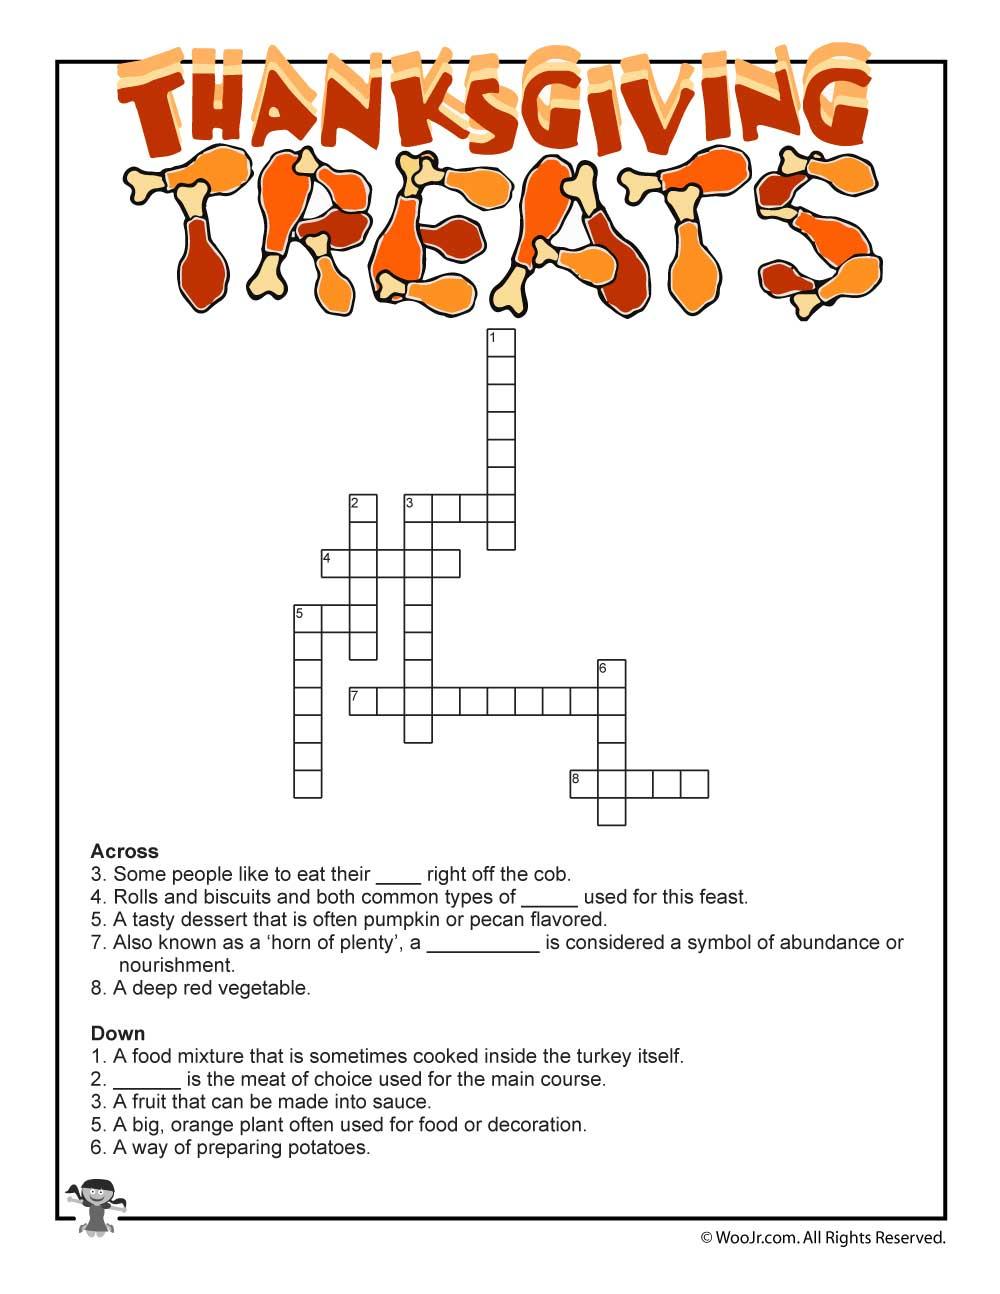 Thanksgiving Crossword Puzzle   Woo! Jr. Kids Activities - Printable Thanksgiving Crossword Puzzles